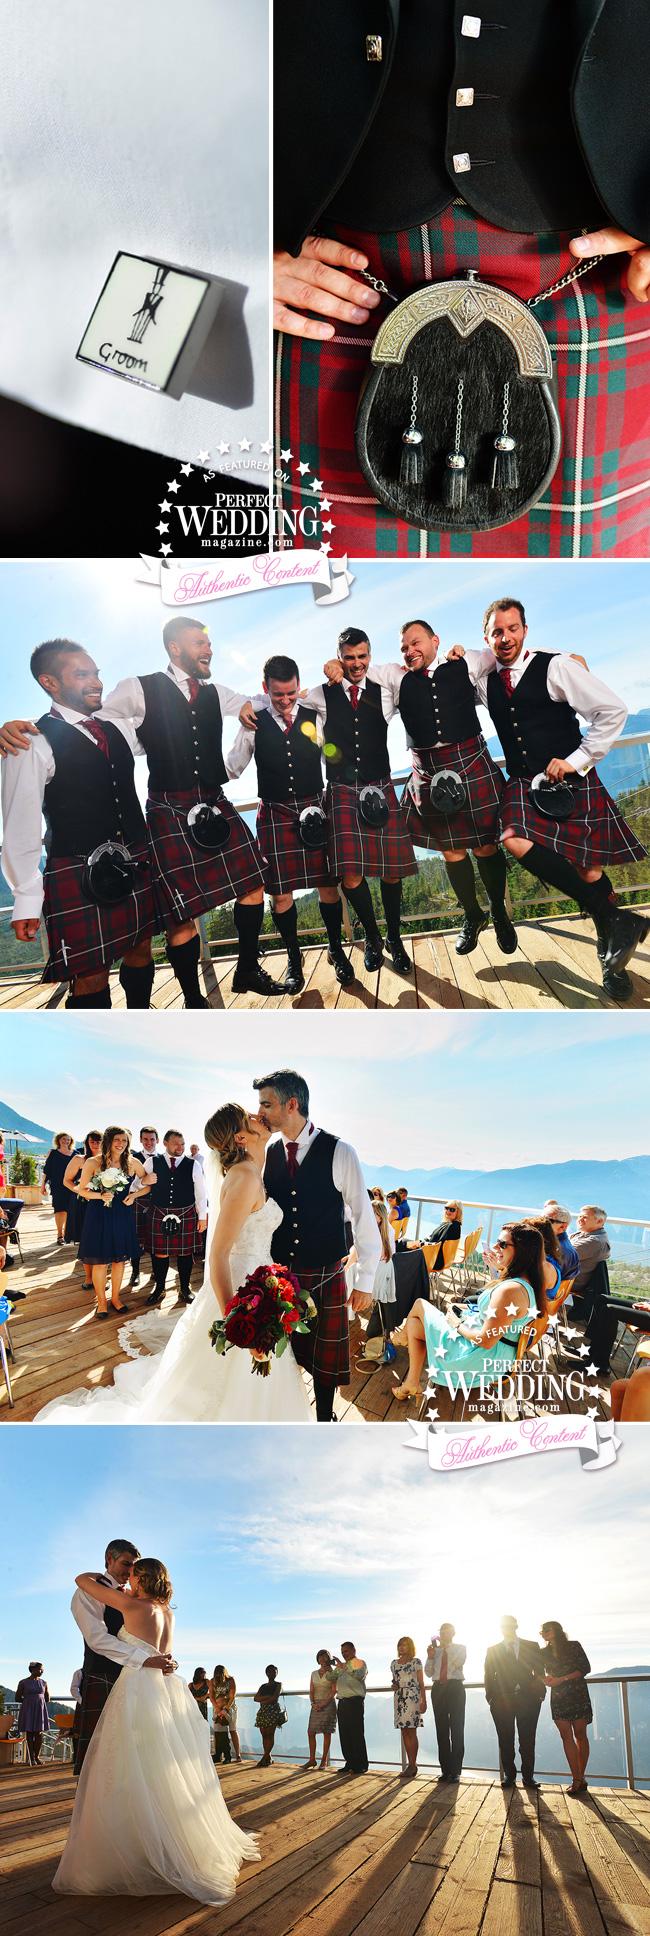 Sea to Sky wedding celebration